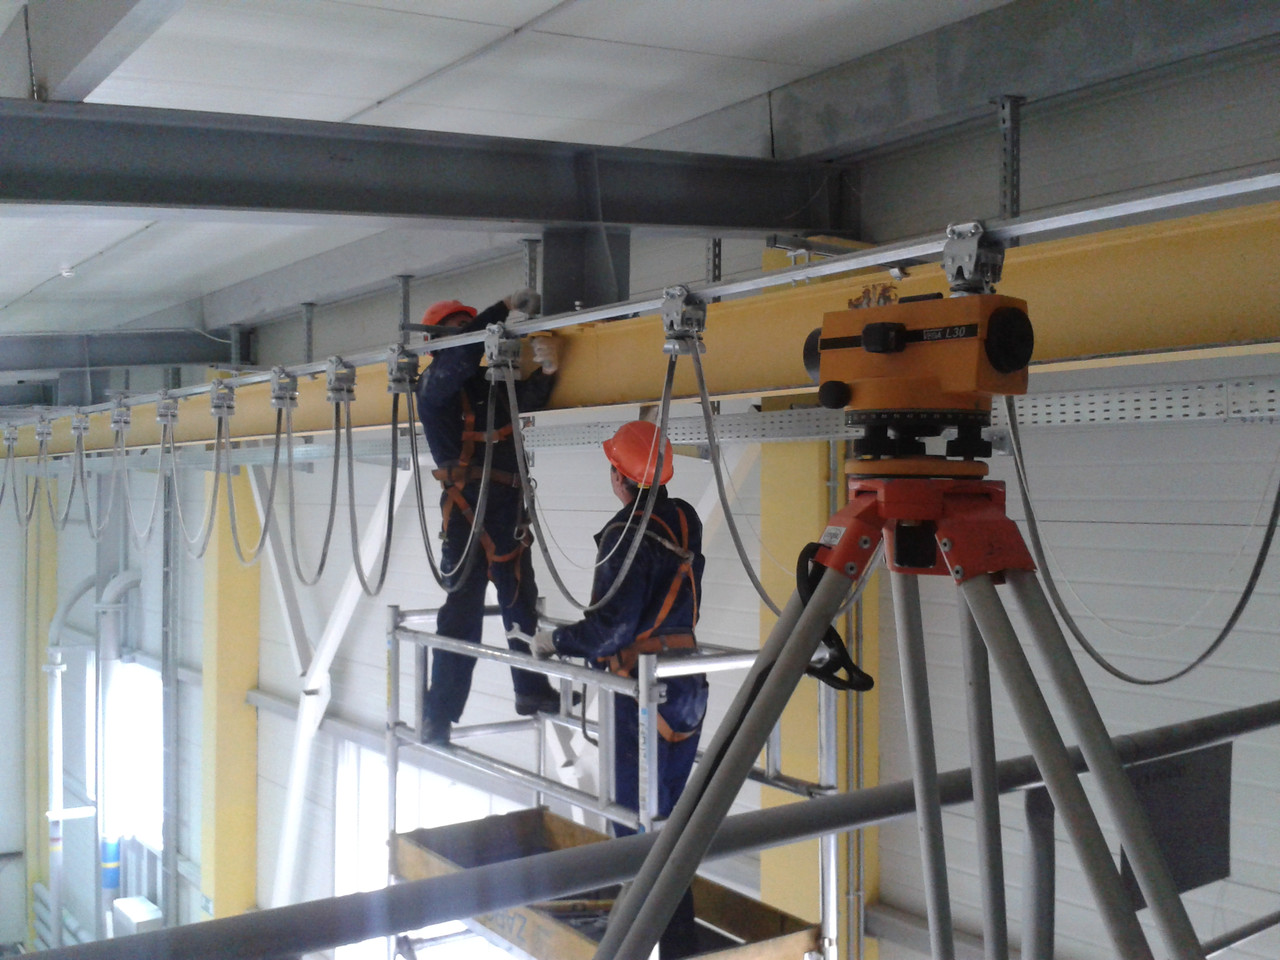 Монтаж кран-балки: технология, подготовка, процесс установки